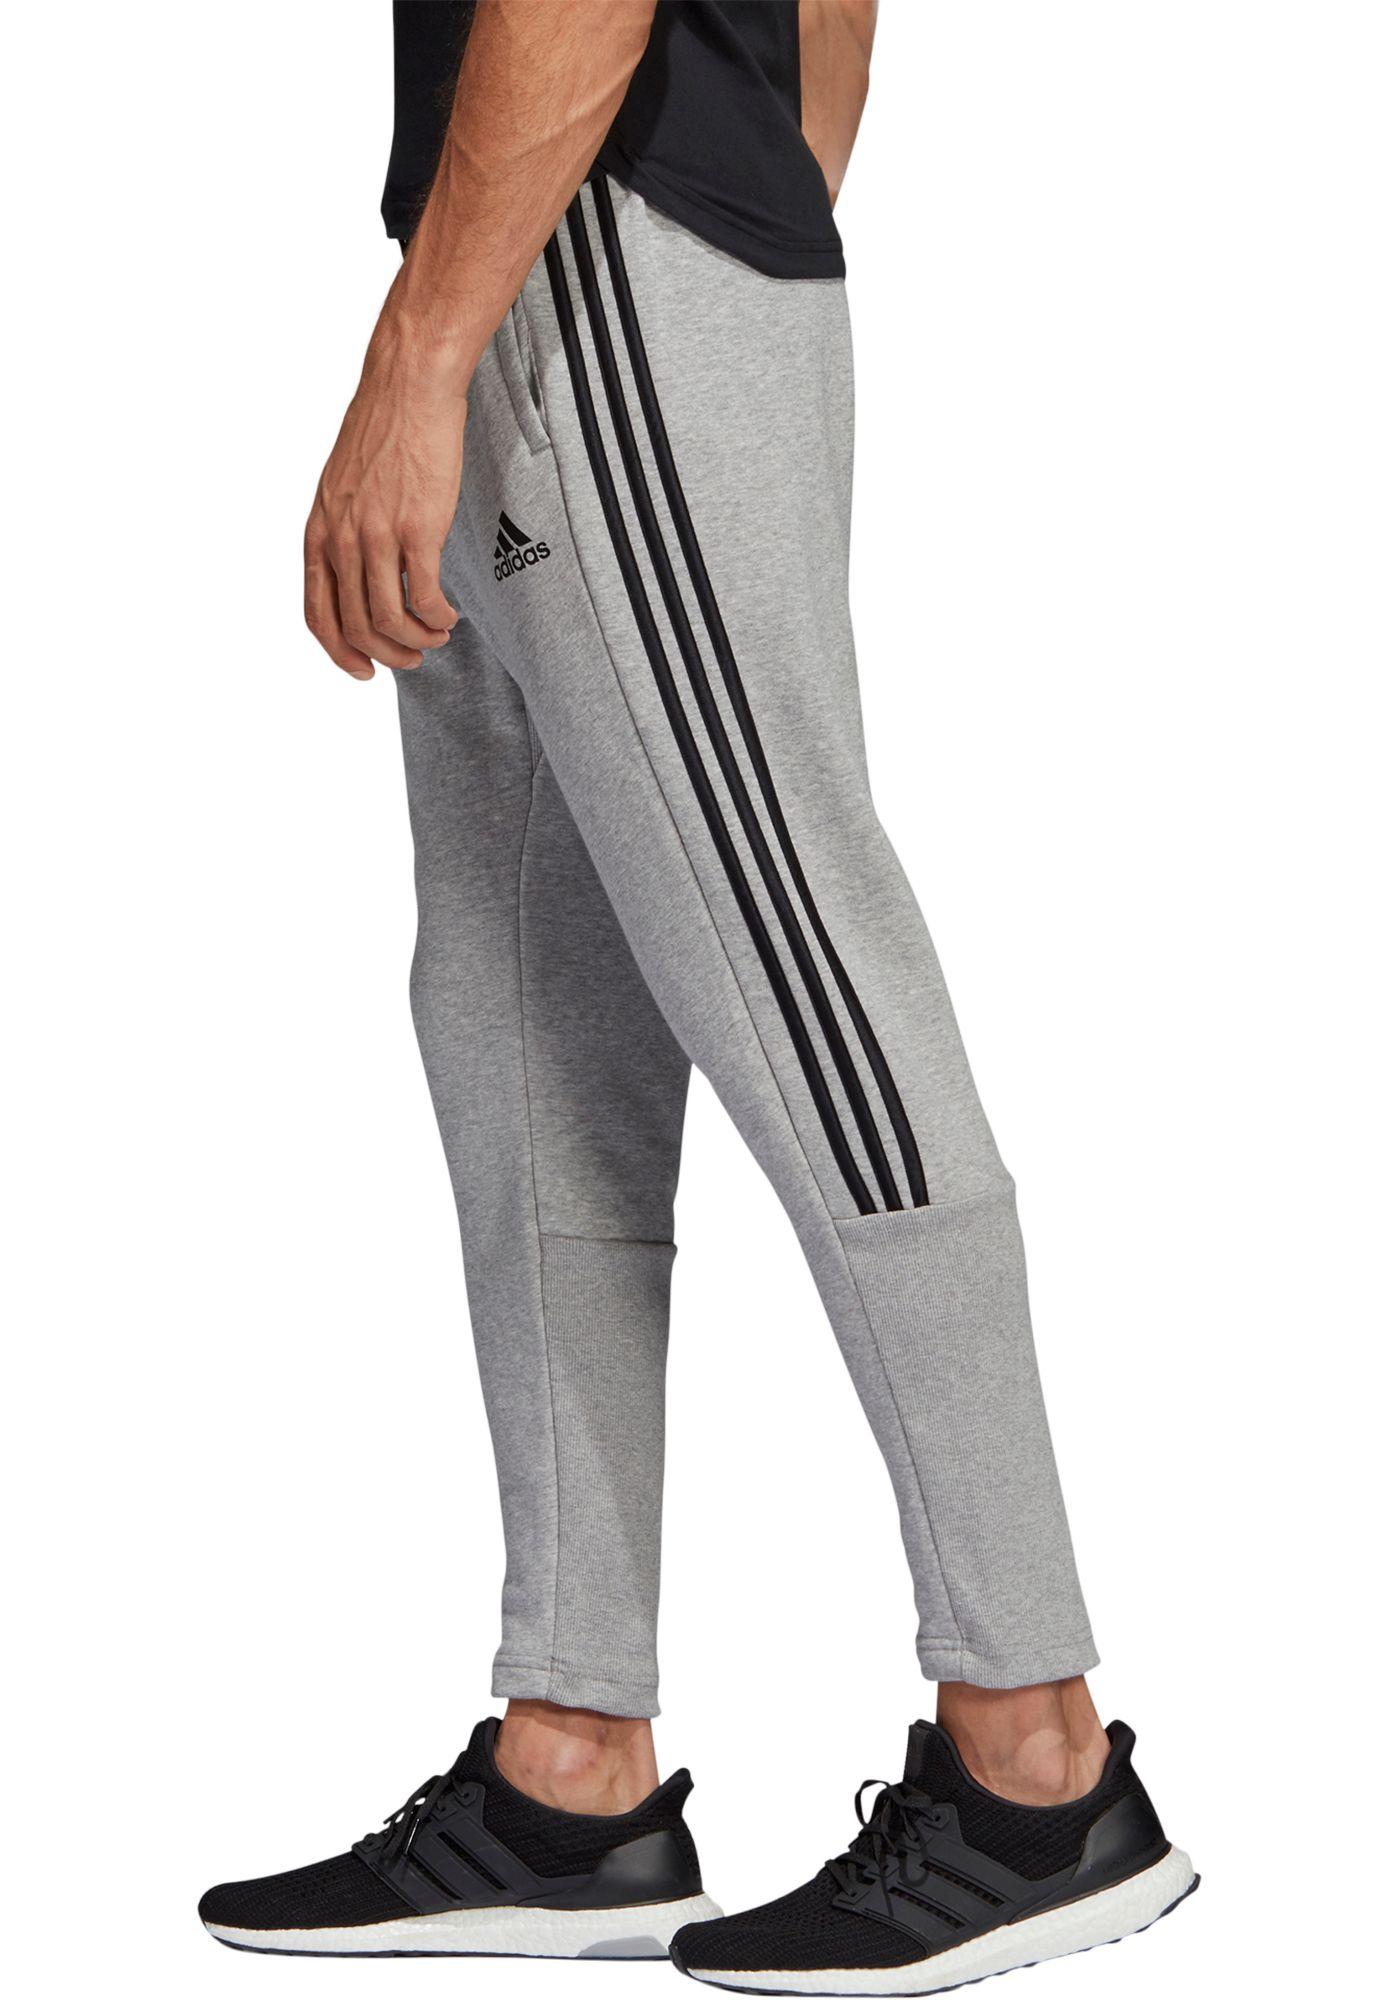 adidas Men's Must Haves 3-Stripes Tiro Pants